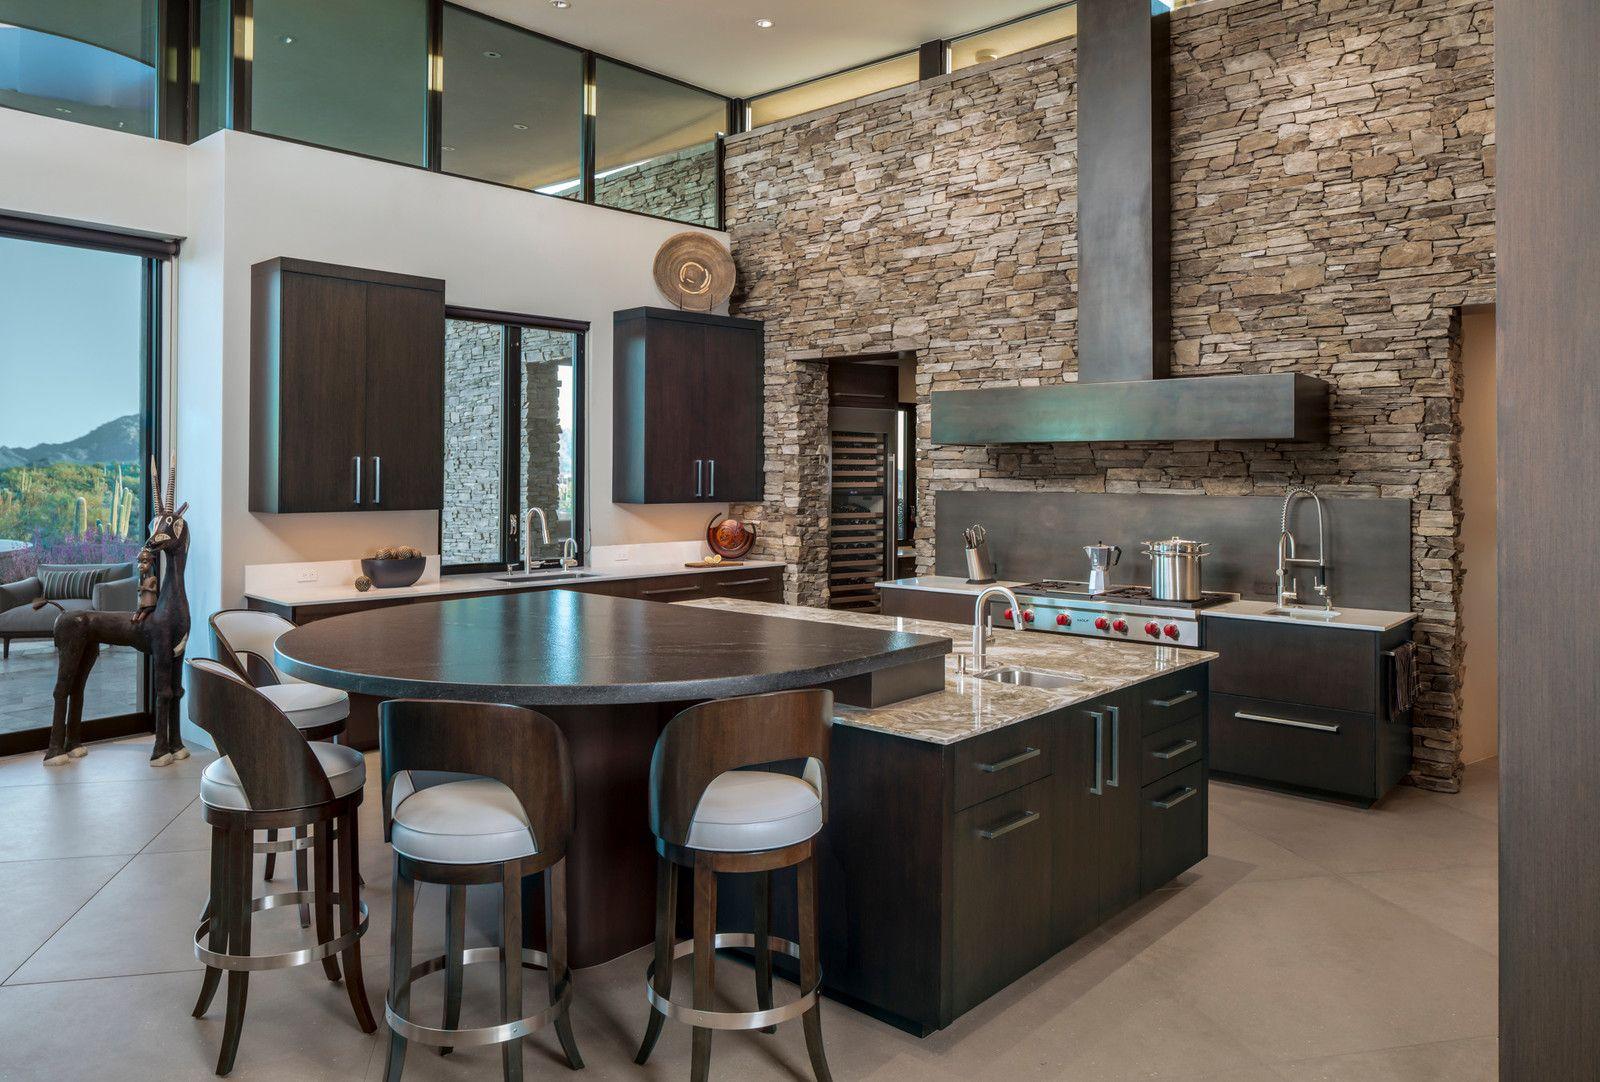 Large trendy ushaped porcelain floor and beige floor kitchen photo